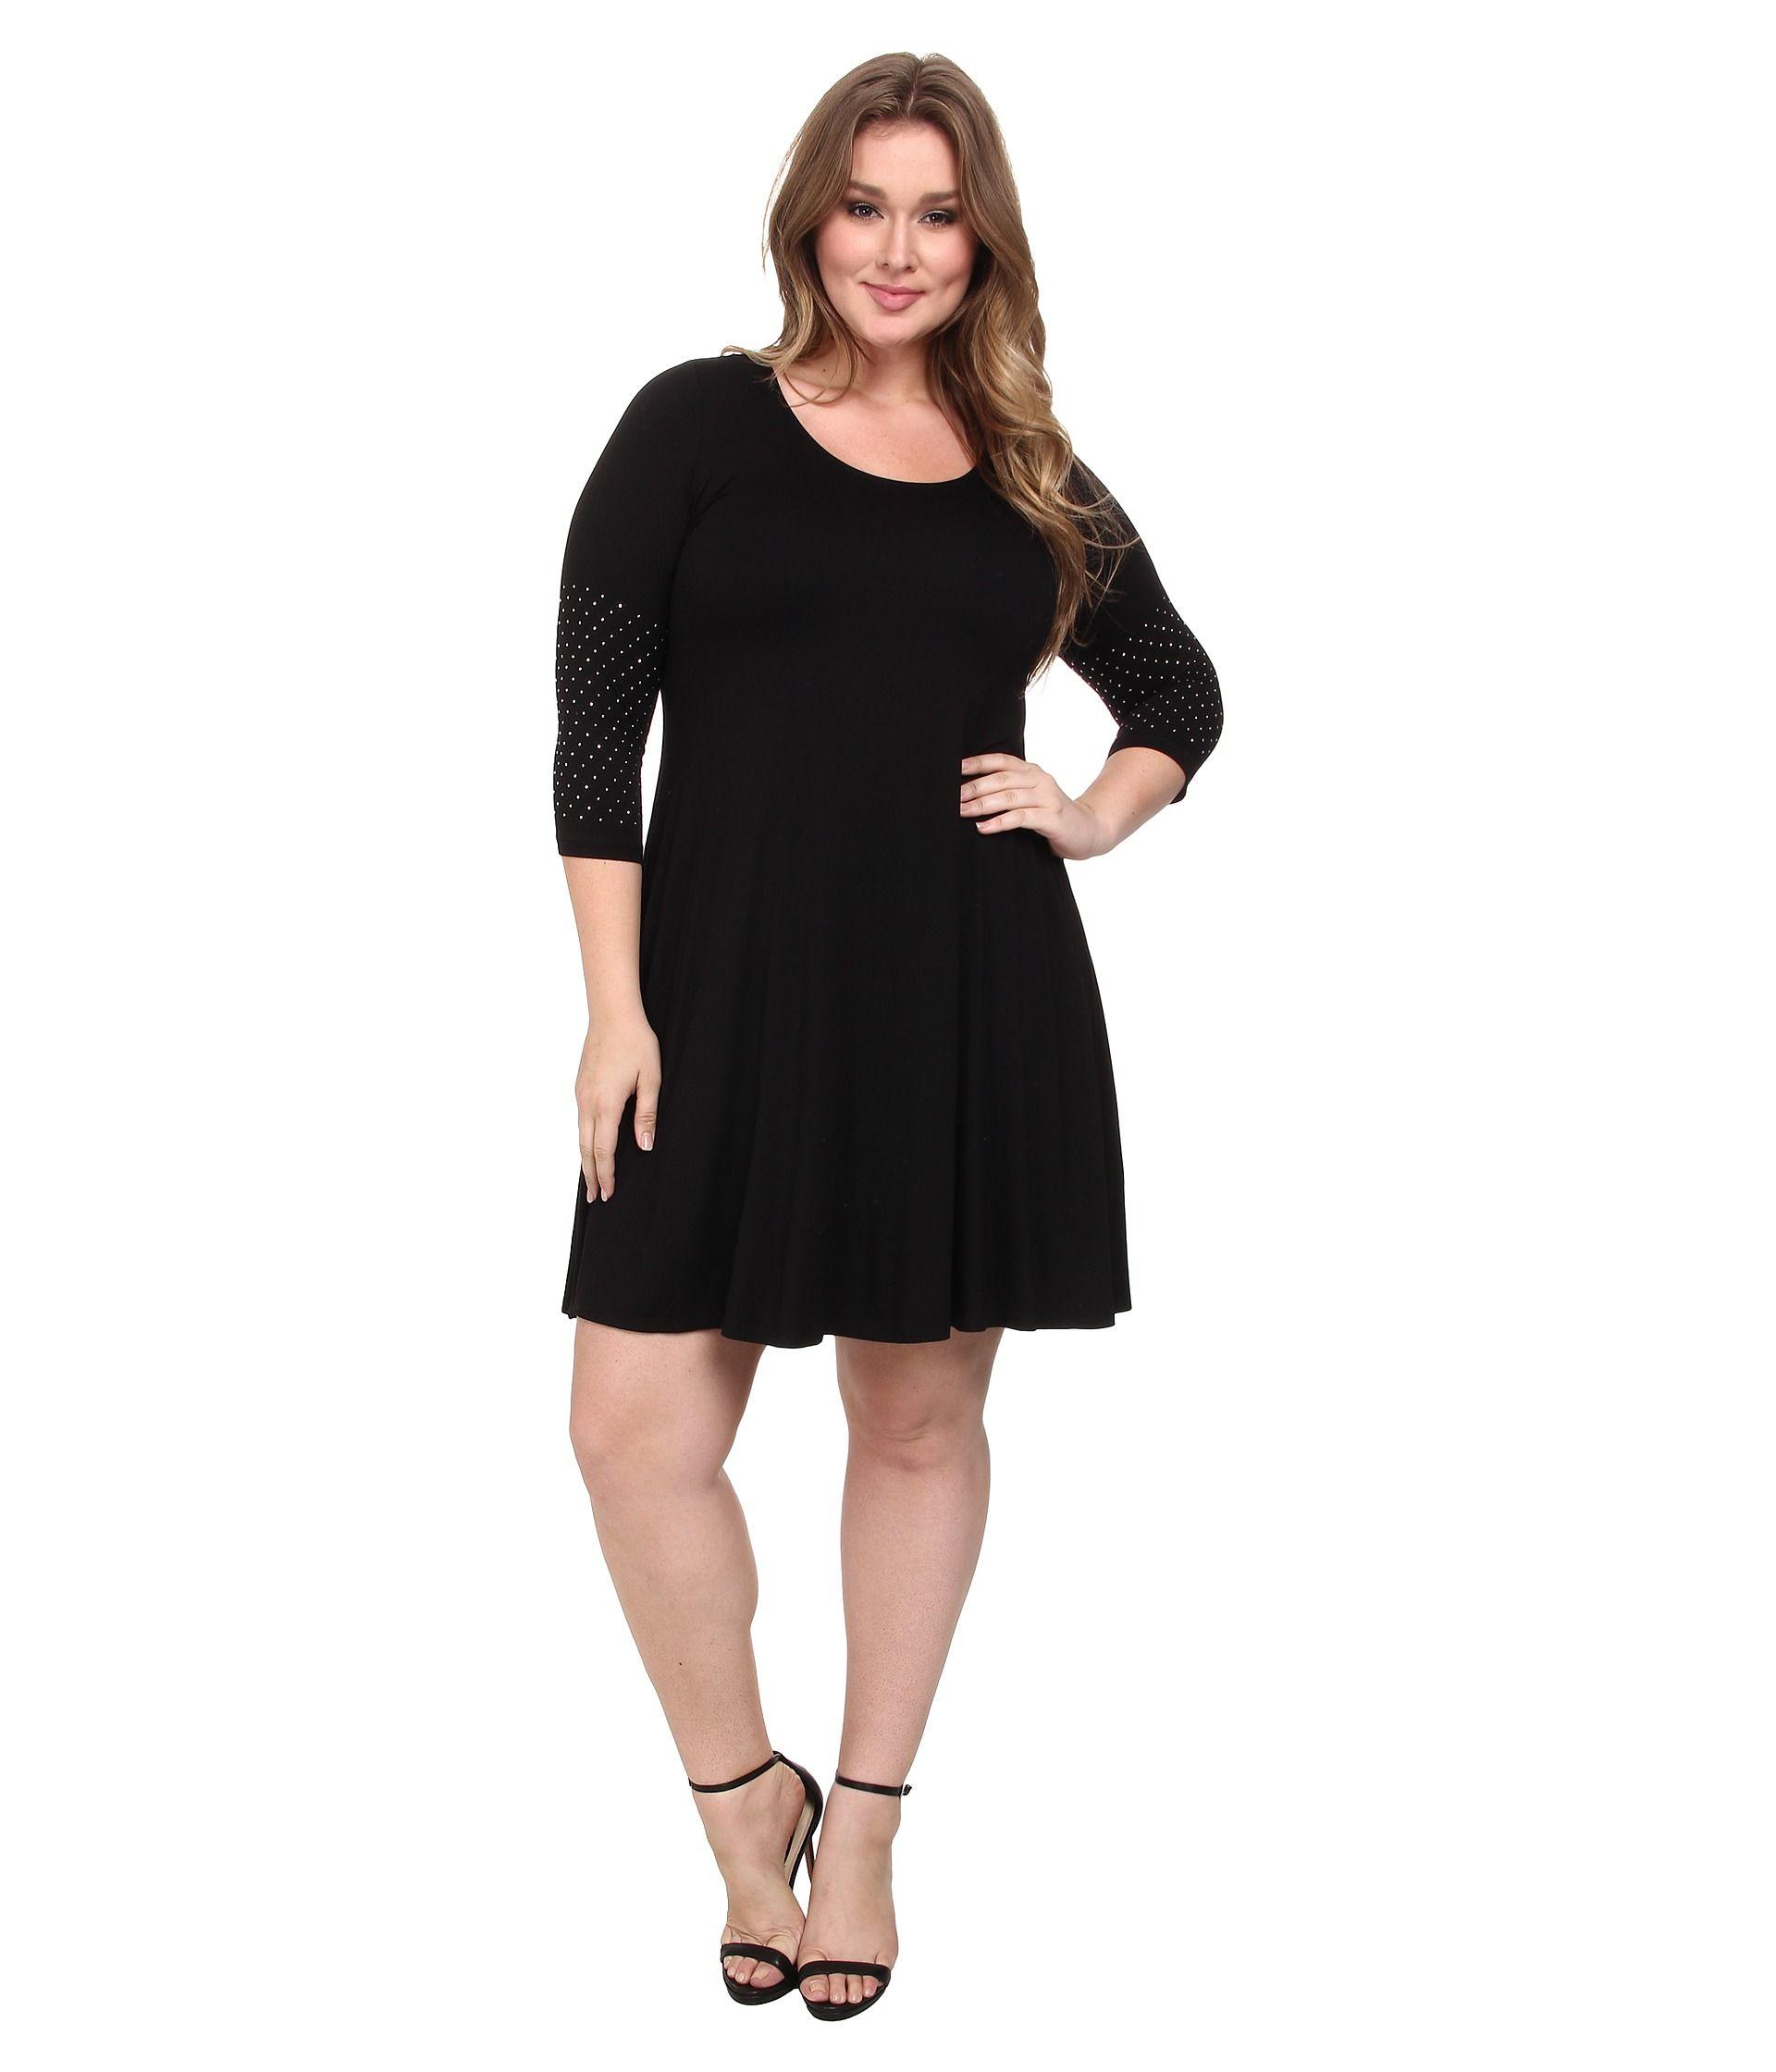 3 4 sleeve black dress plus size image collections - dresses